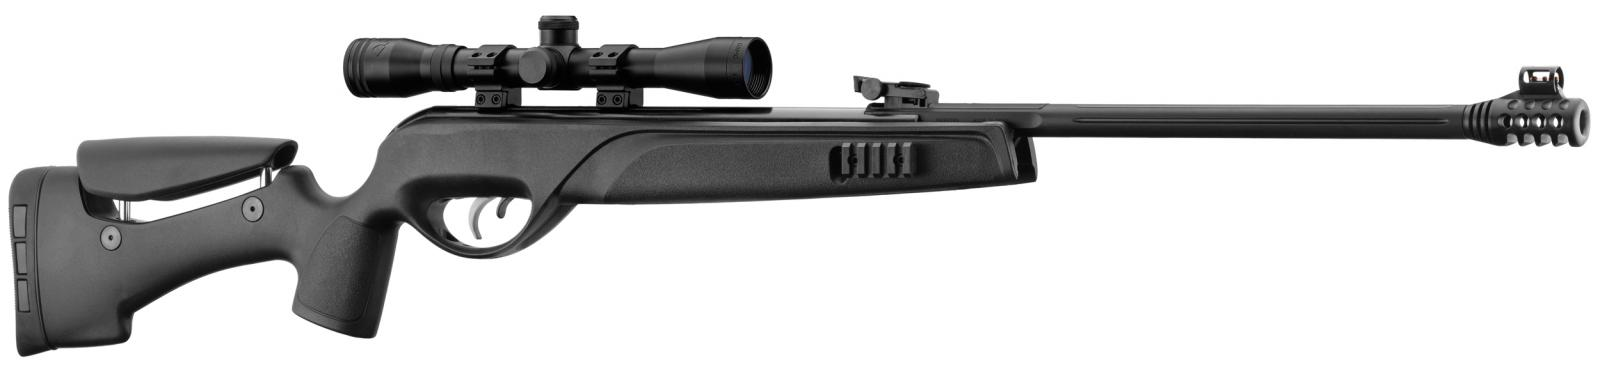 Carabine GAMO TACTICAL STORM + Lunette 4x32wr